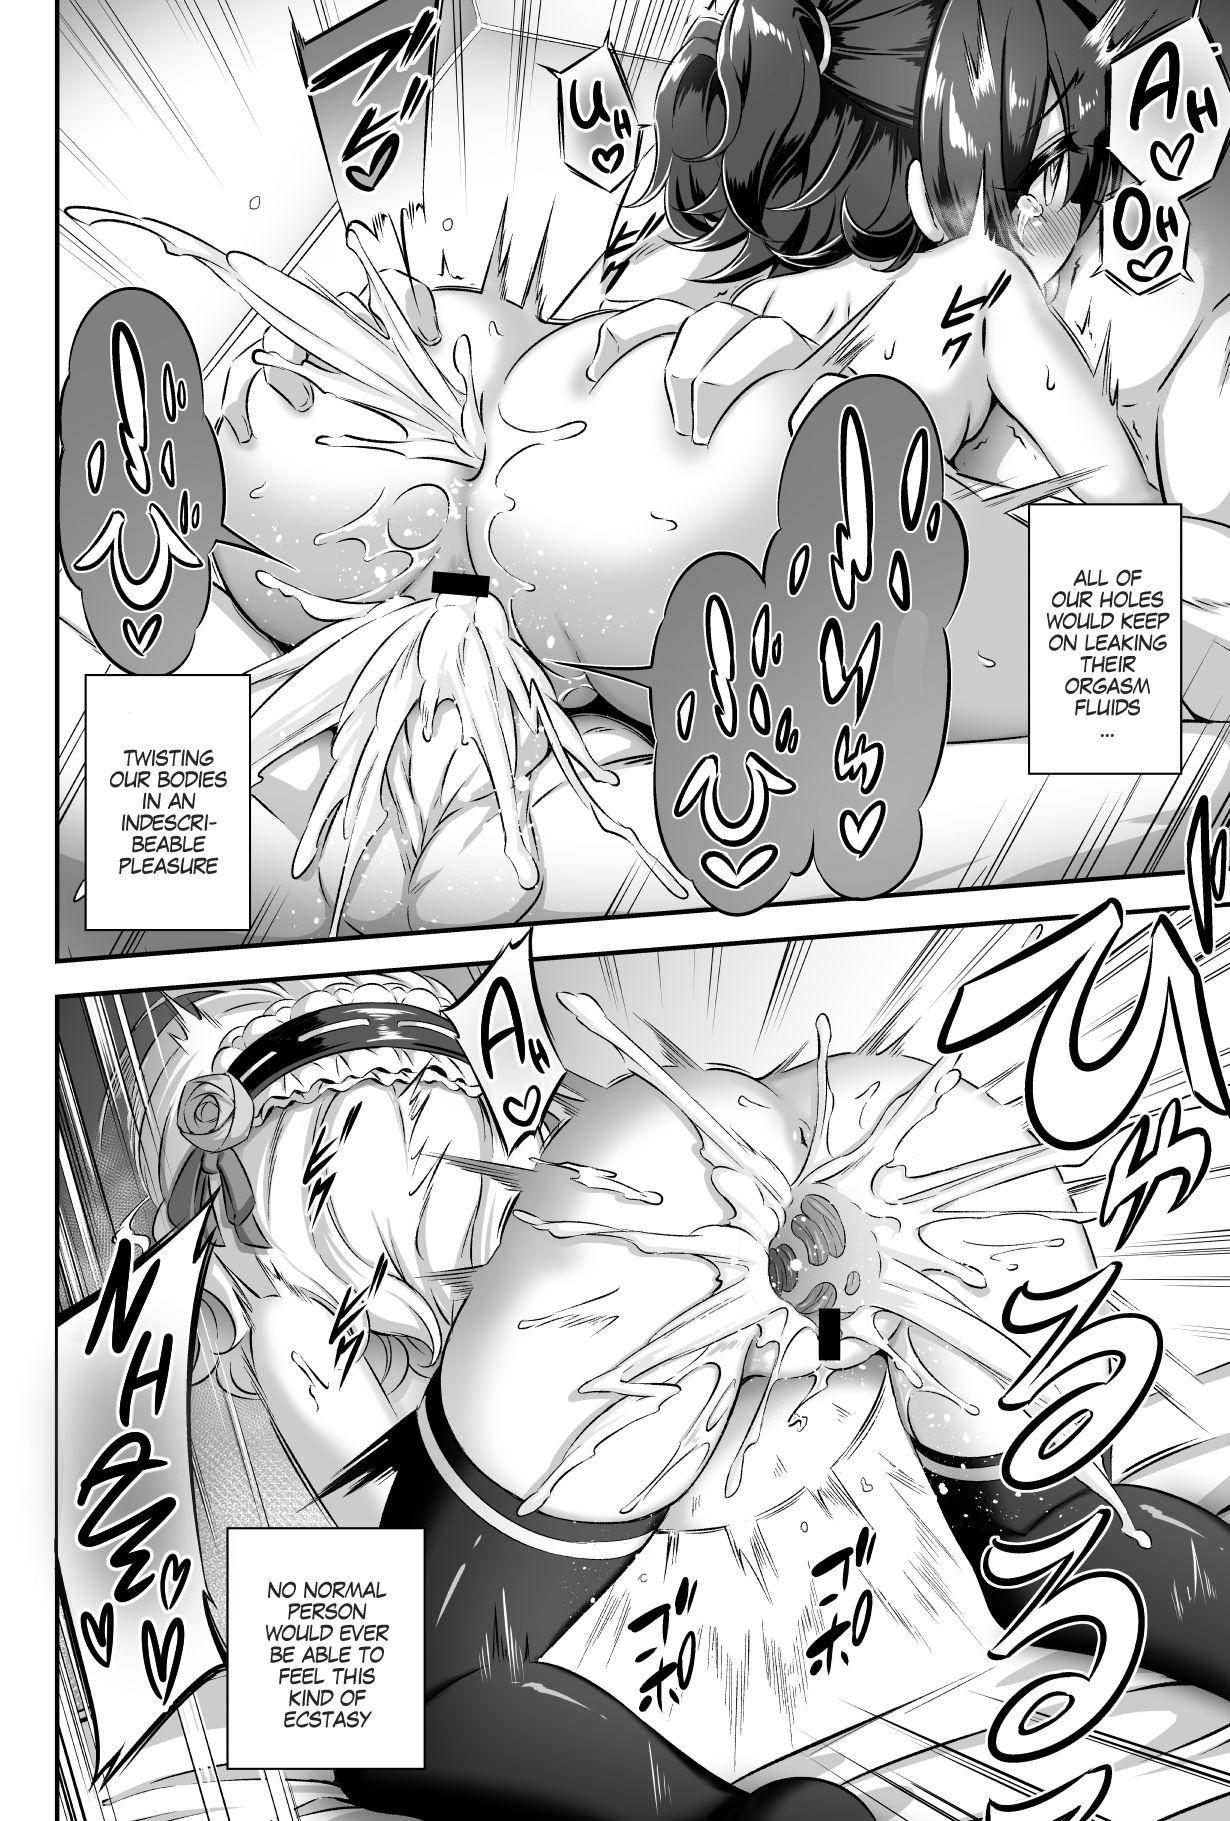 [Achromic (Musouduki)] Maso Loli 1 P-san no Ochinpo Dorei ni Naritai | Maso Loli 1 All We Want Is To Become Slaves For P-san's Cock (THE IDOLM@STER CINDERELLA GIRLS) [English] [MegaFagget] [Digital] 28